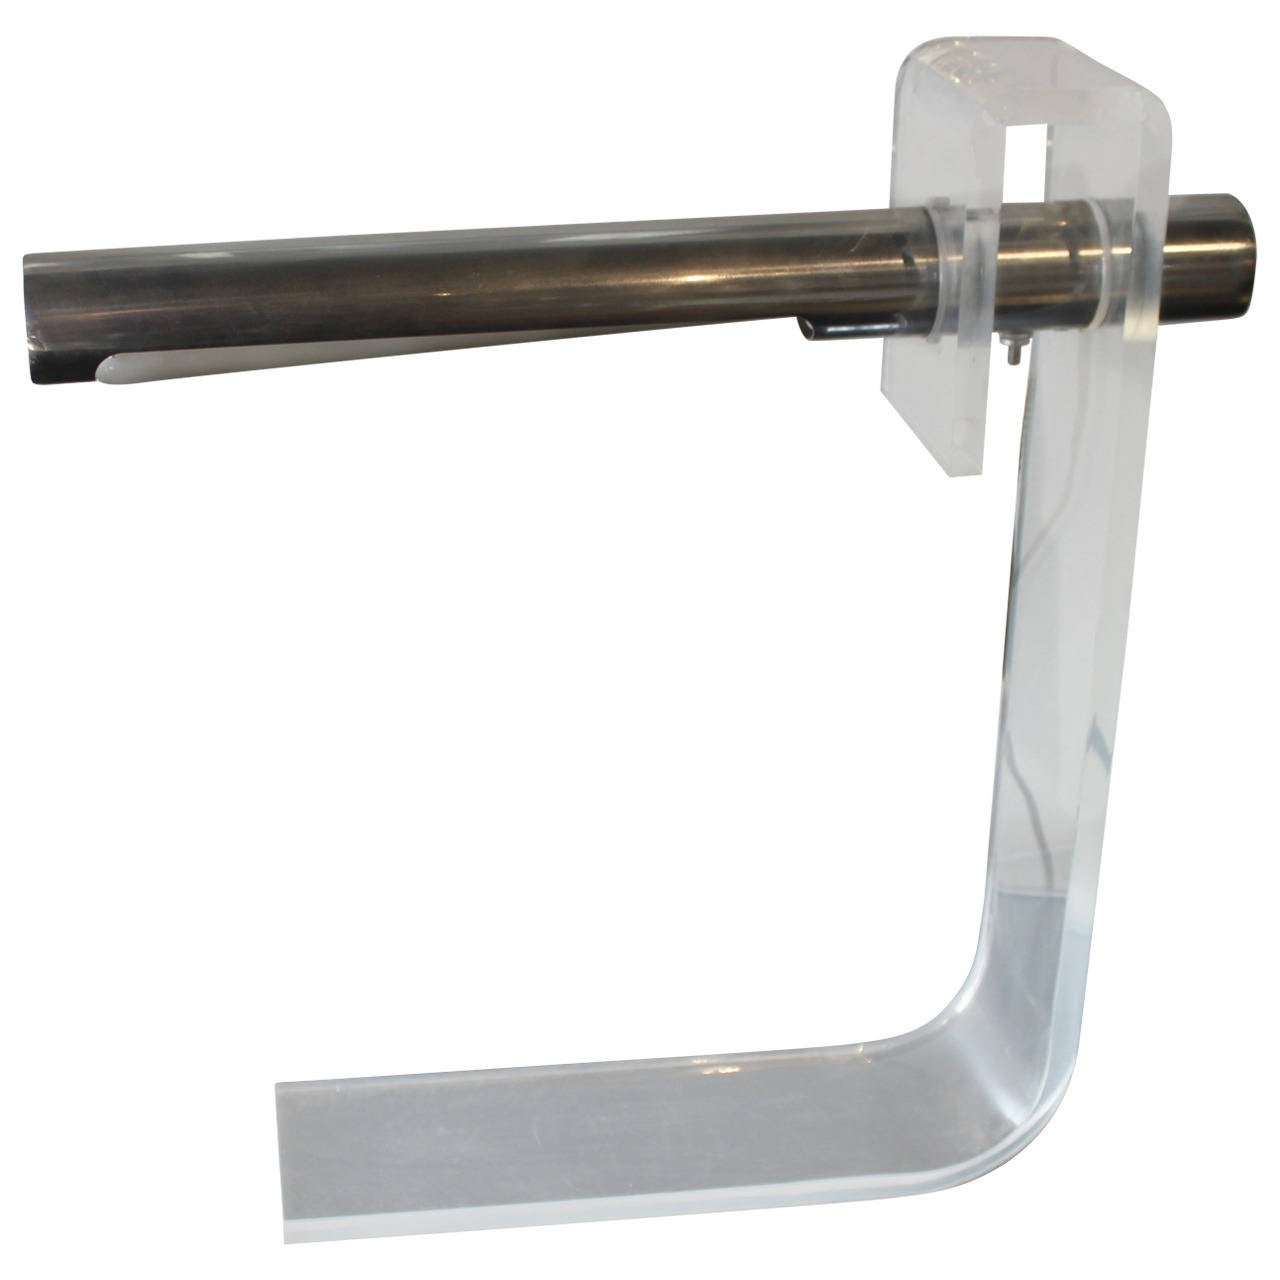 Aluminum and Acrylic Table Lamp by Sonneman